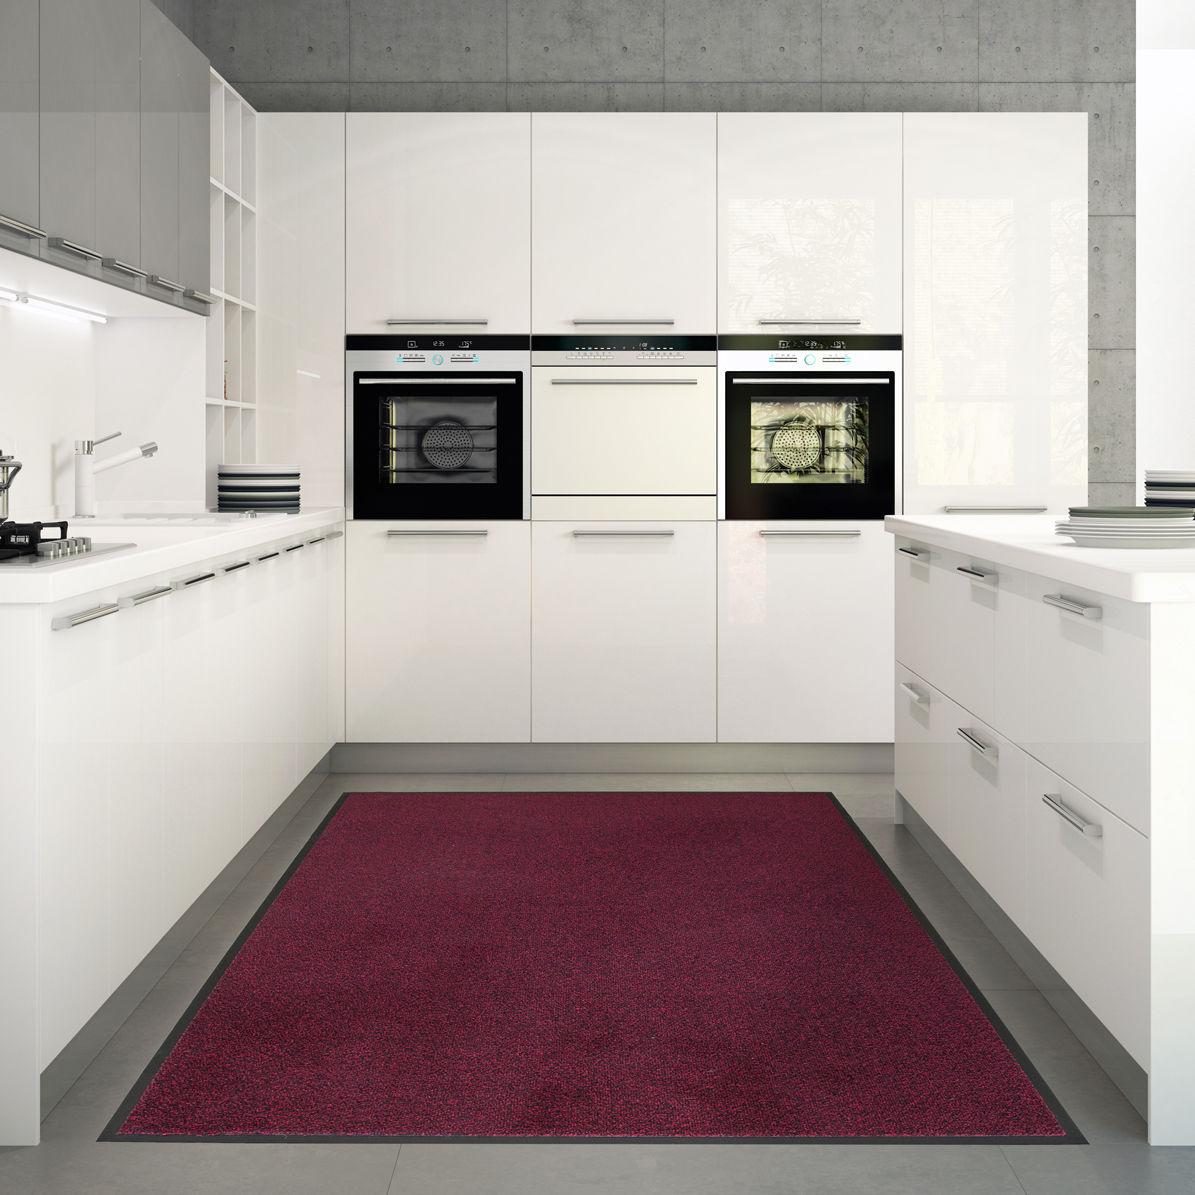 8 95 Gbp Red Heavy Duty Barrier Mats Non Slip Washable Kitchen Mats Durable Doormats Uk Ebay Home Garden Floor Rugs Rugs Uk Kitchen Mat